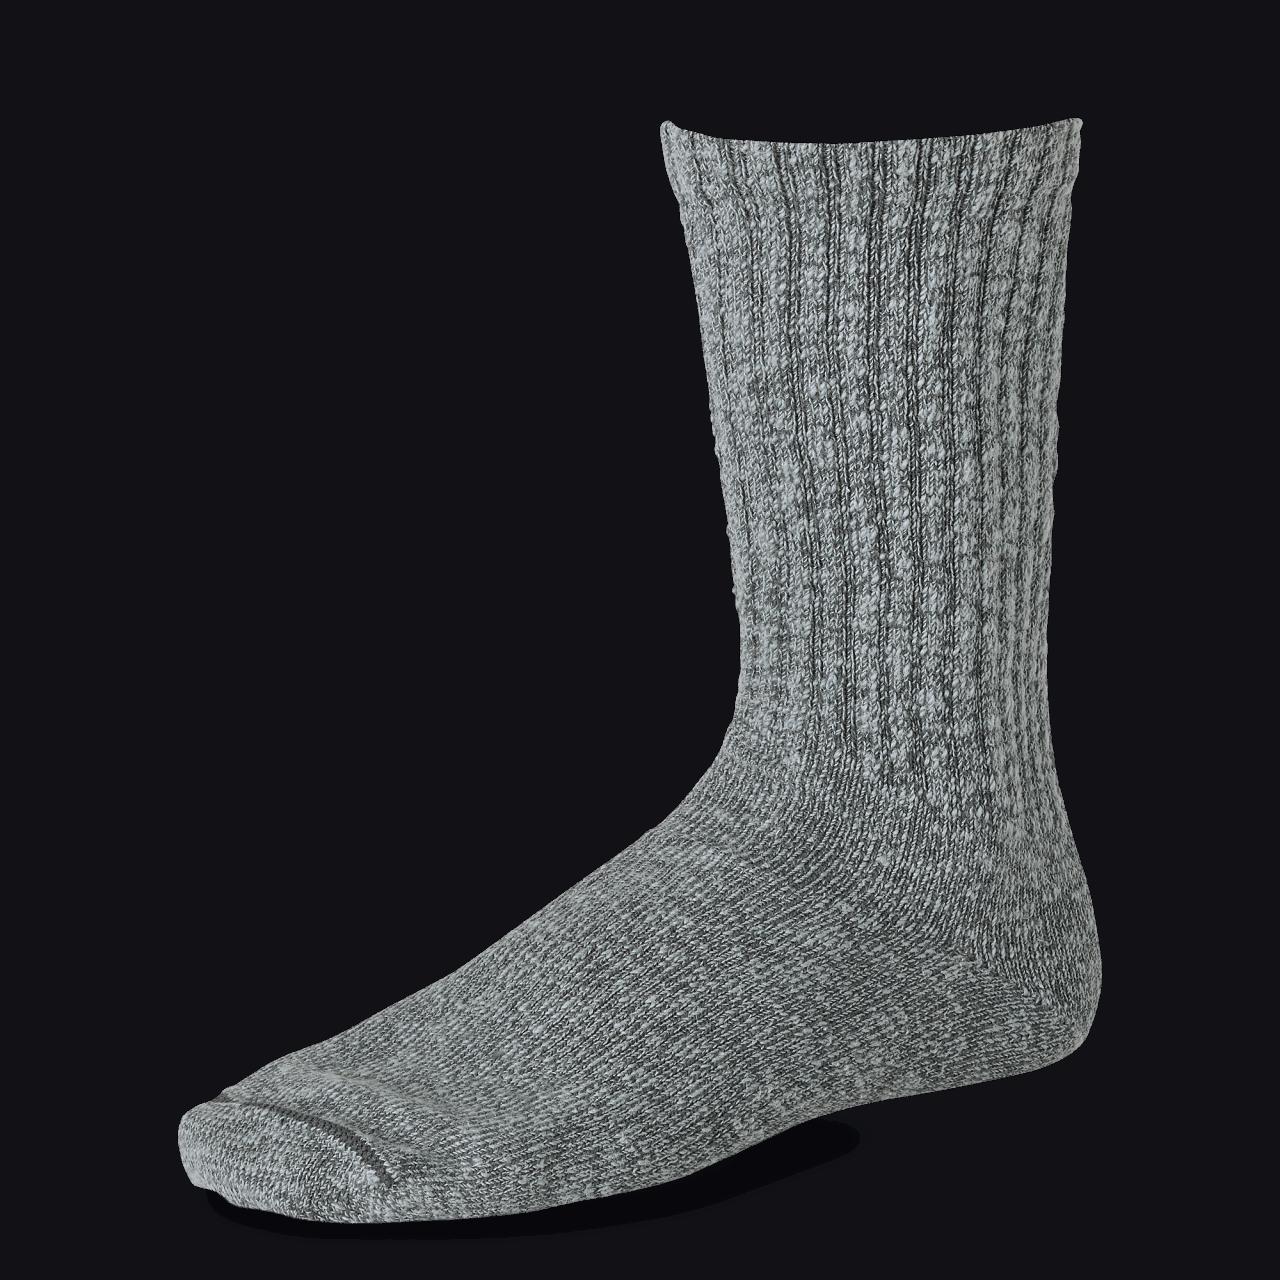 Red Wing Tonal Cotton Ragg Sock - black/gray